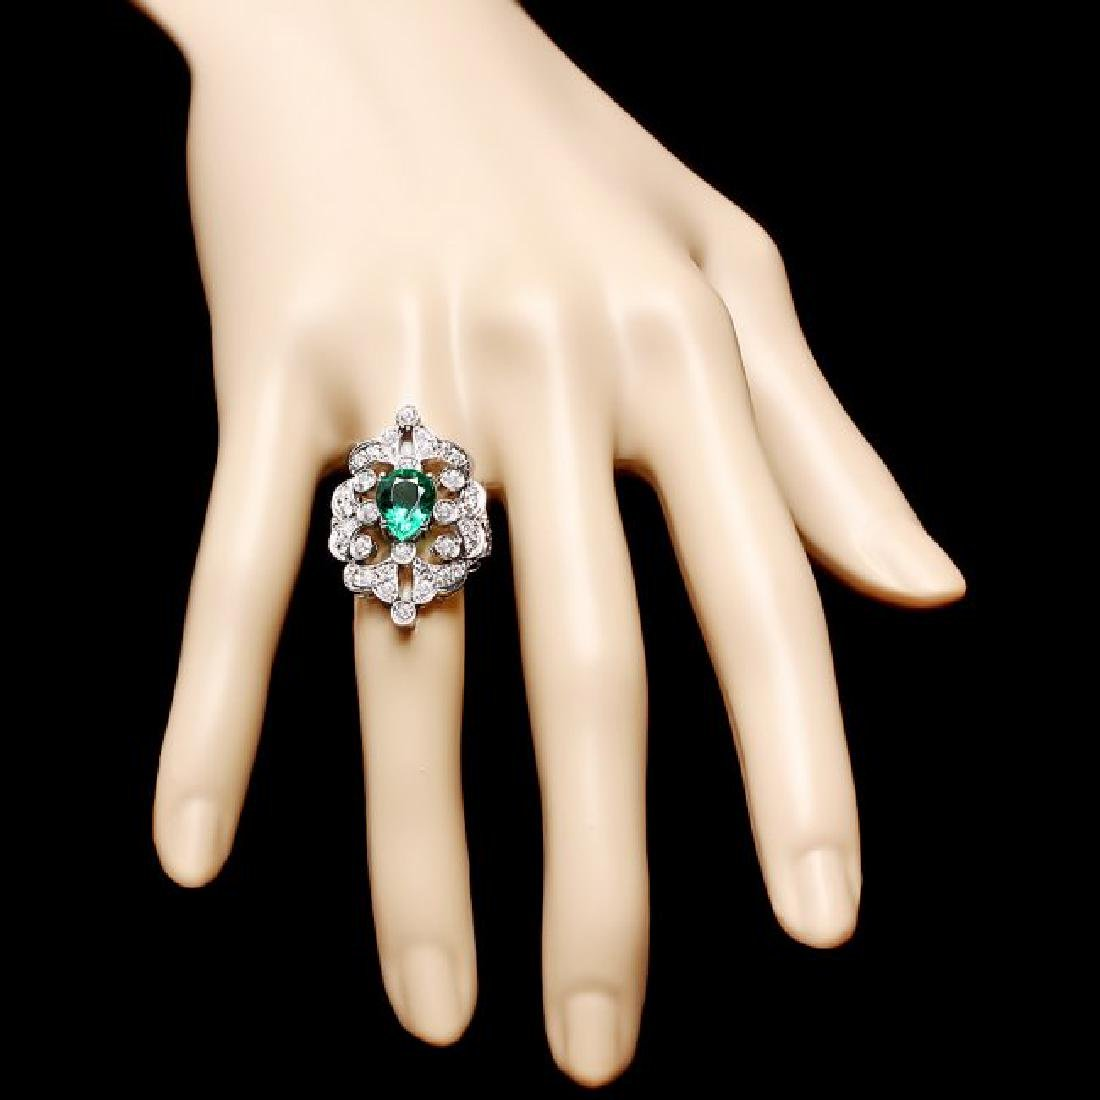 14k White Gold 2.00ct Emerald 1.35ct Diamond Ring - 4